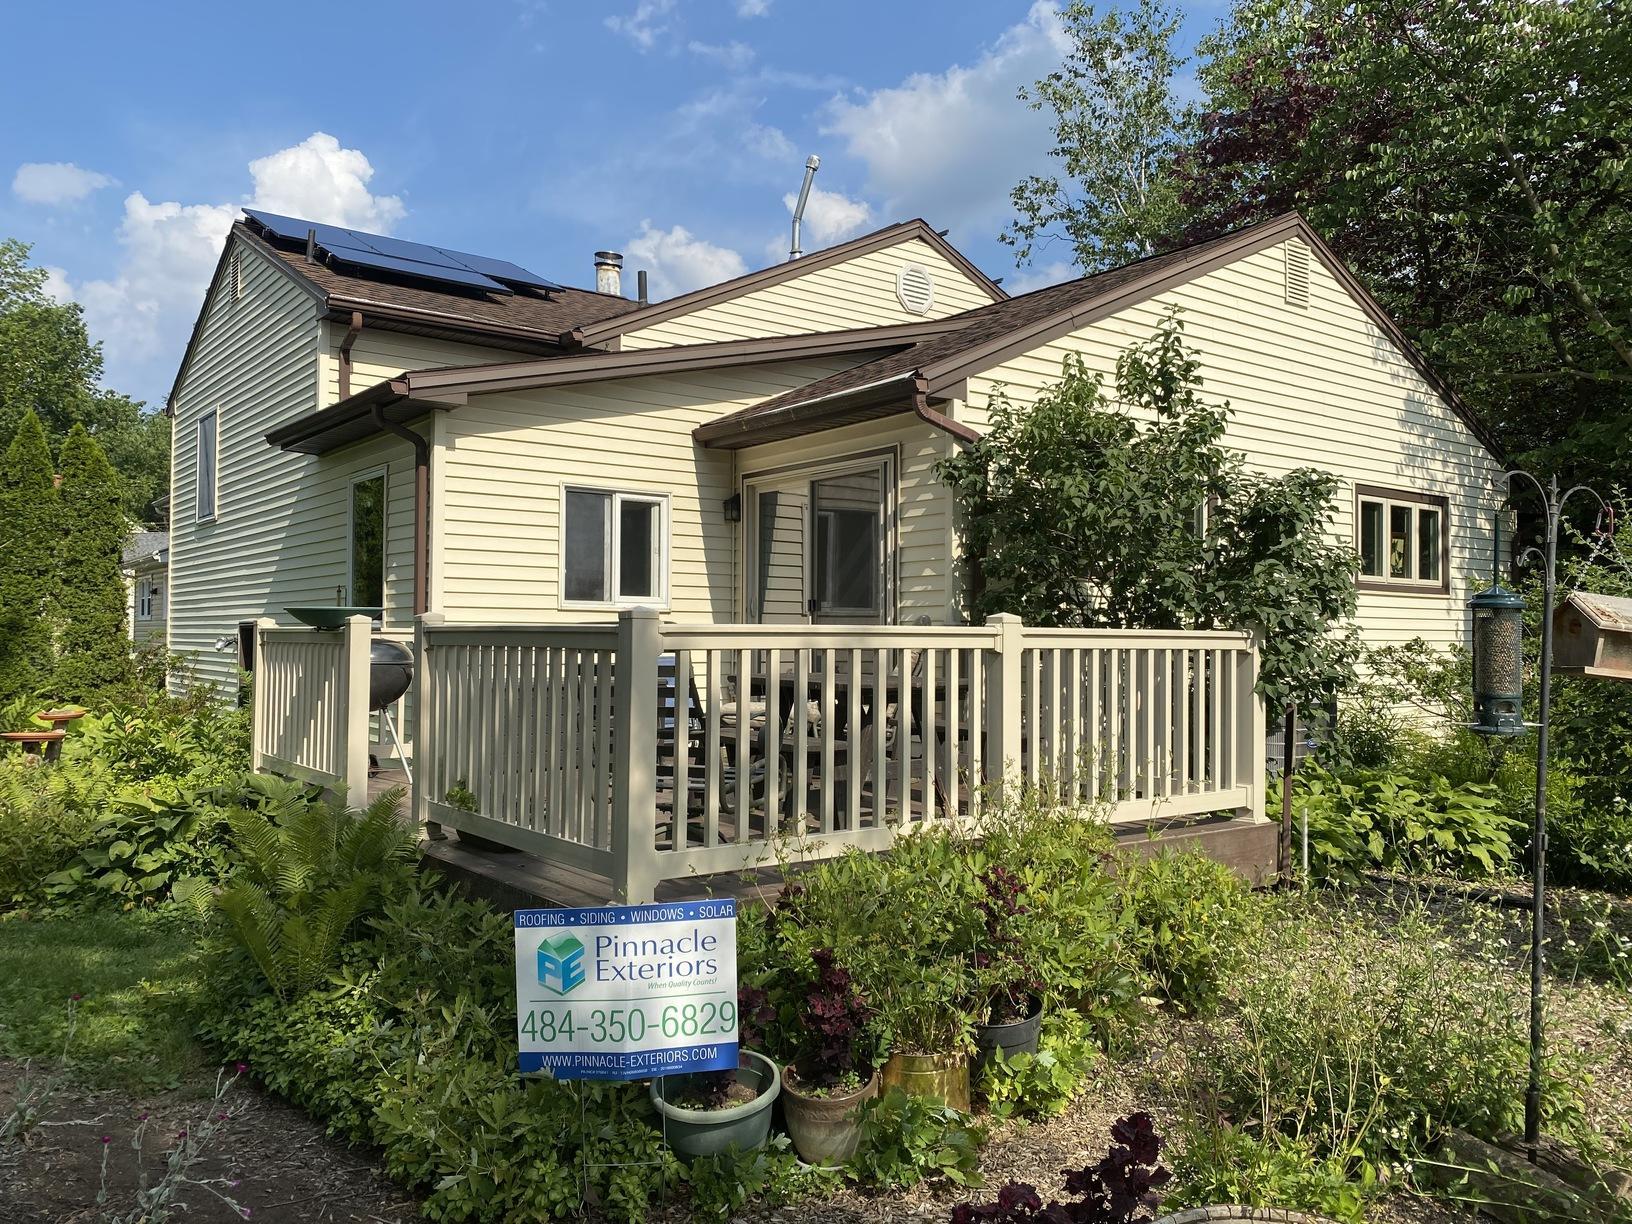 Solar Installation done in Harrusburg, PA